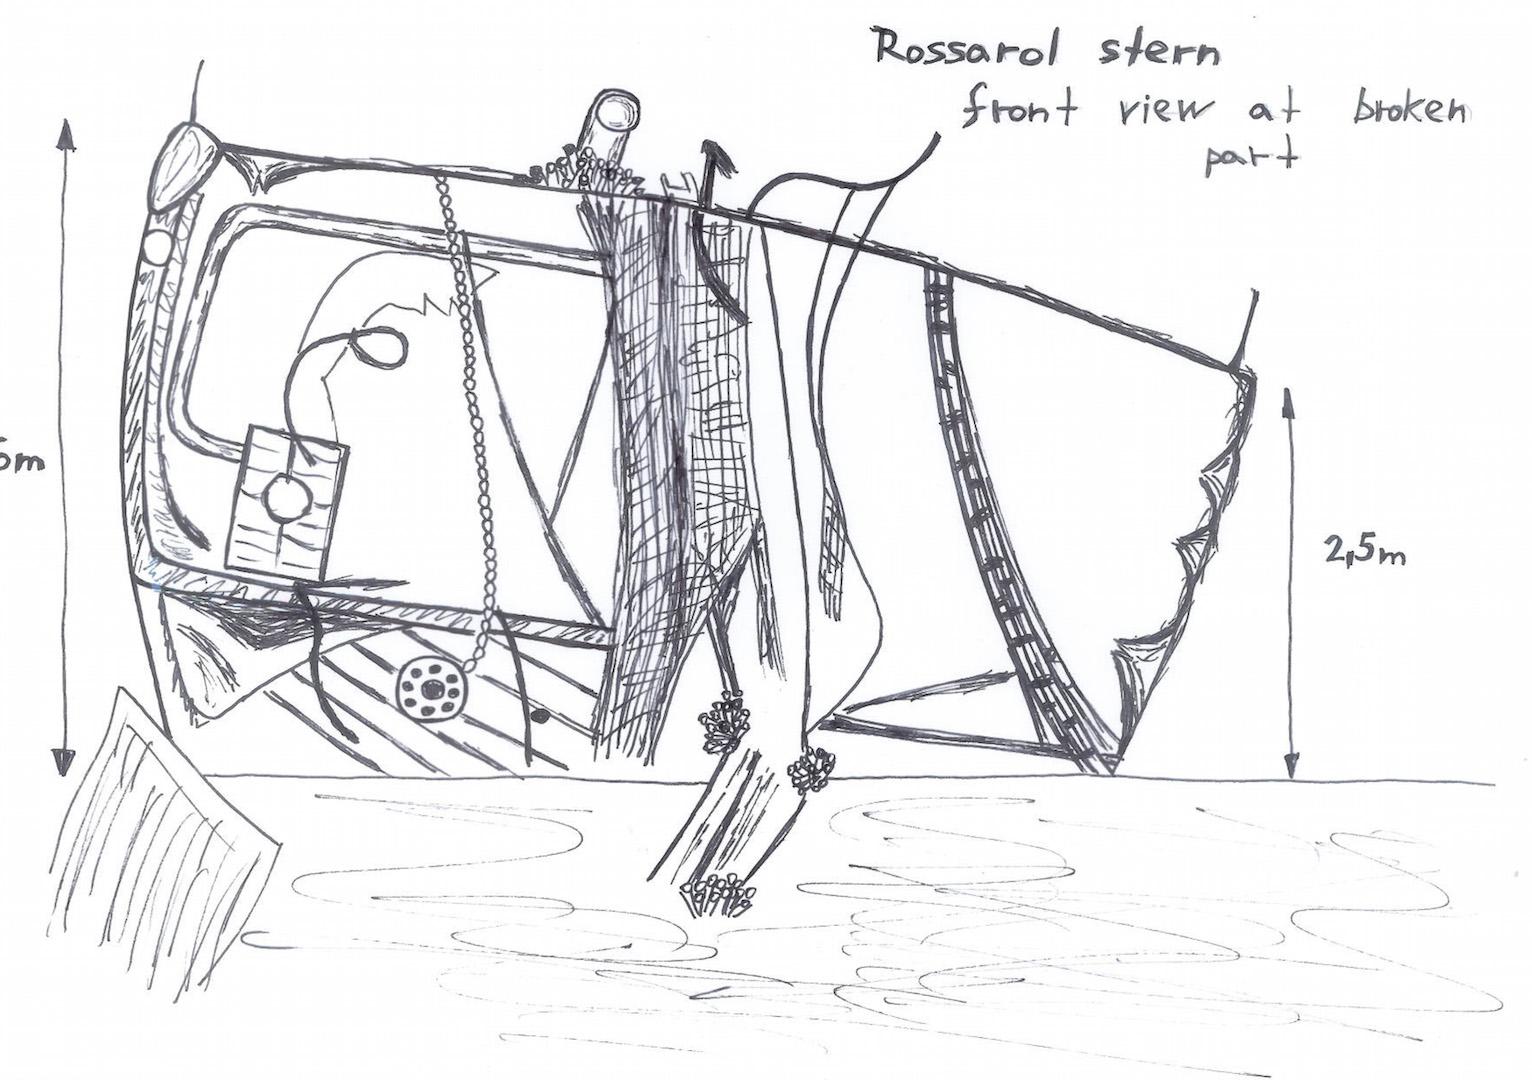 Rossarol broken stern part